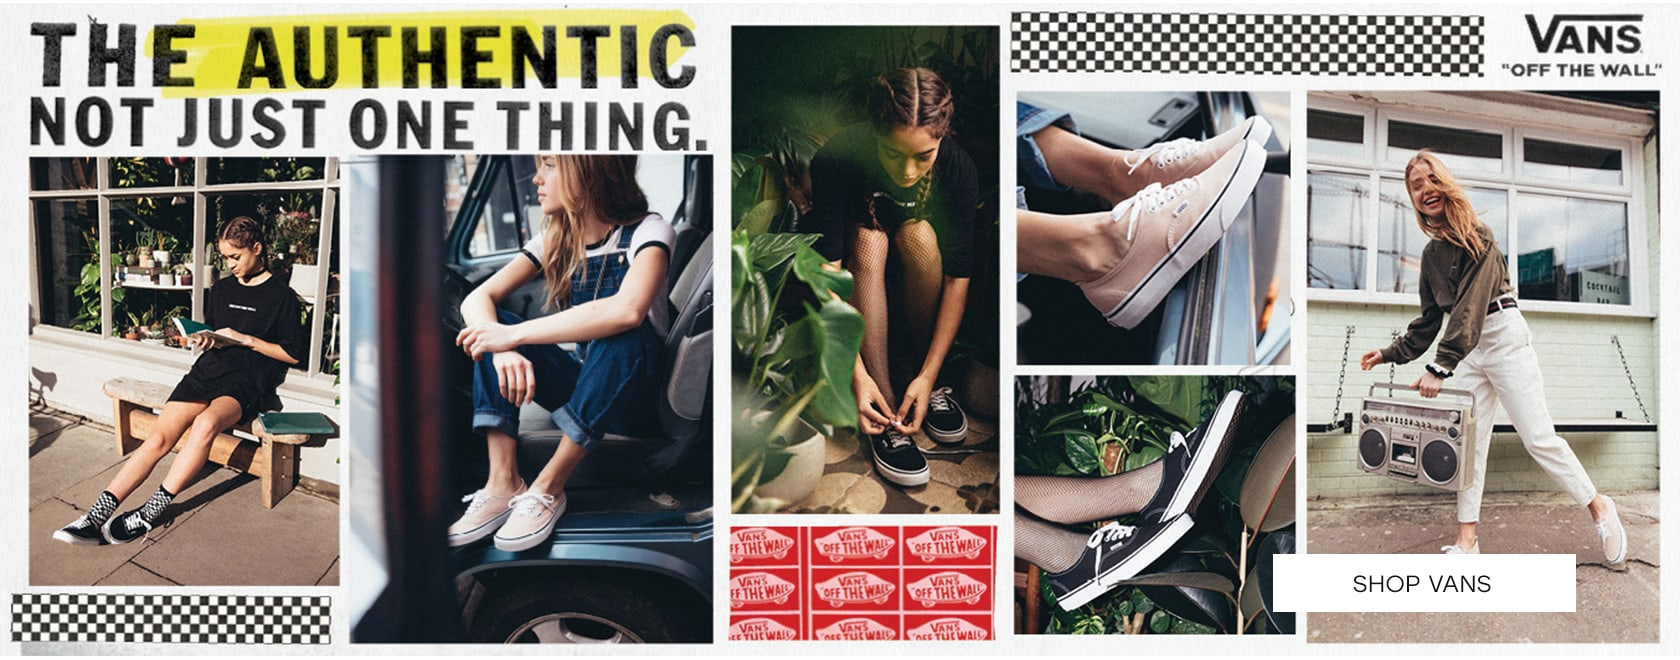 yeezy adidas nike plus size activewear for women